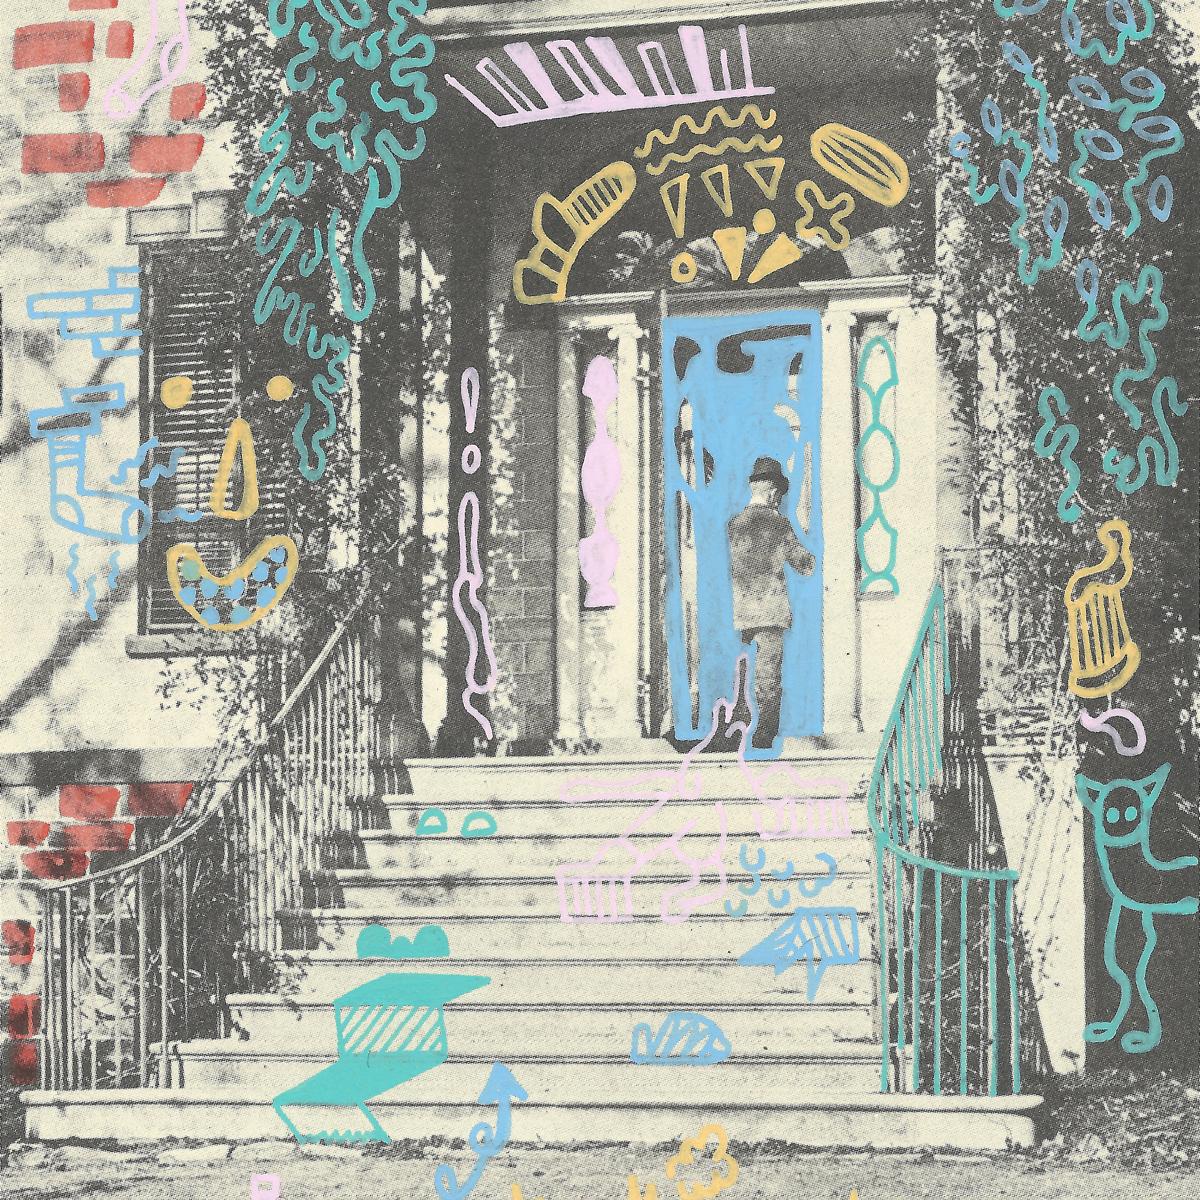 Dana Robinson, Lost Monuments, 2015